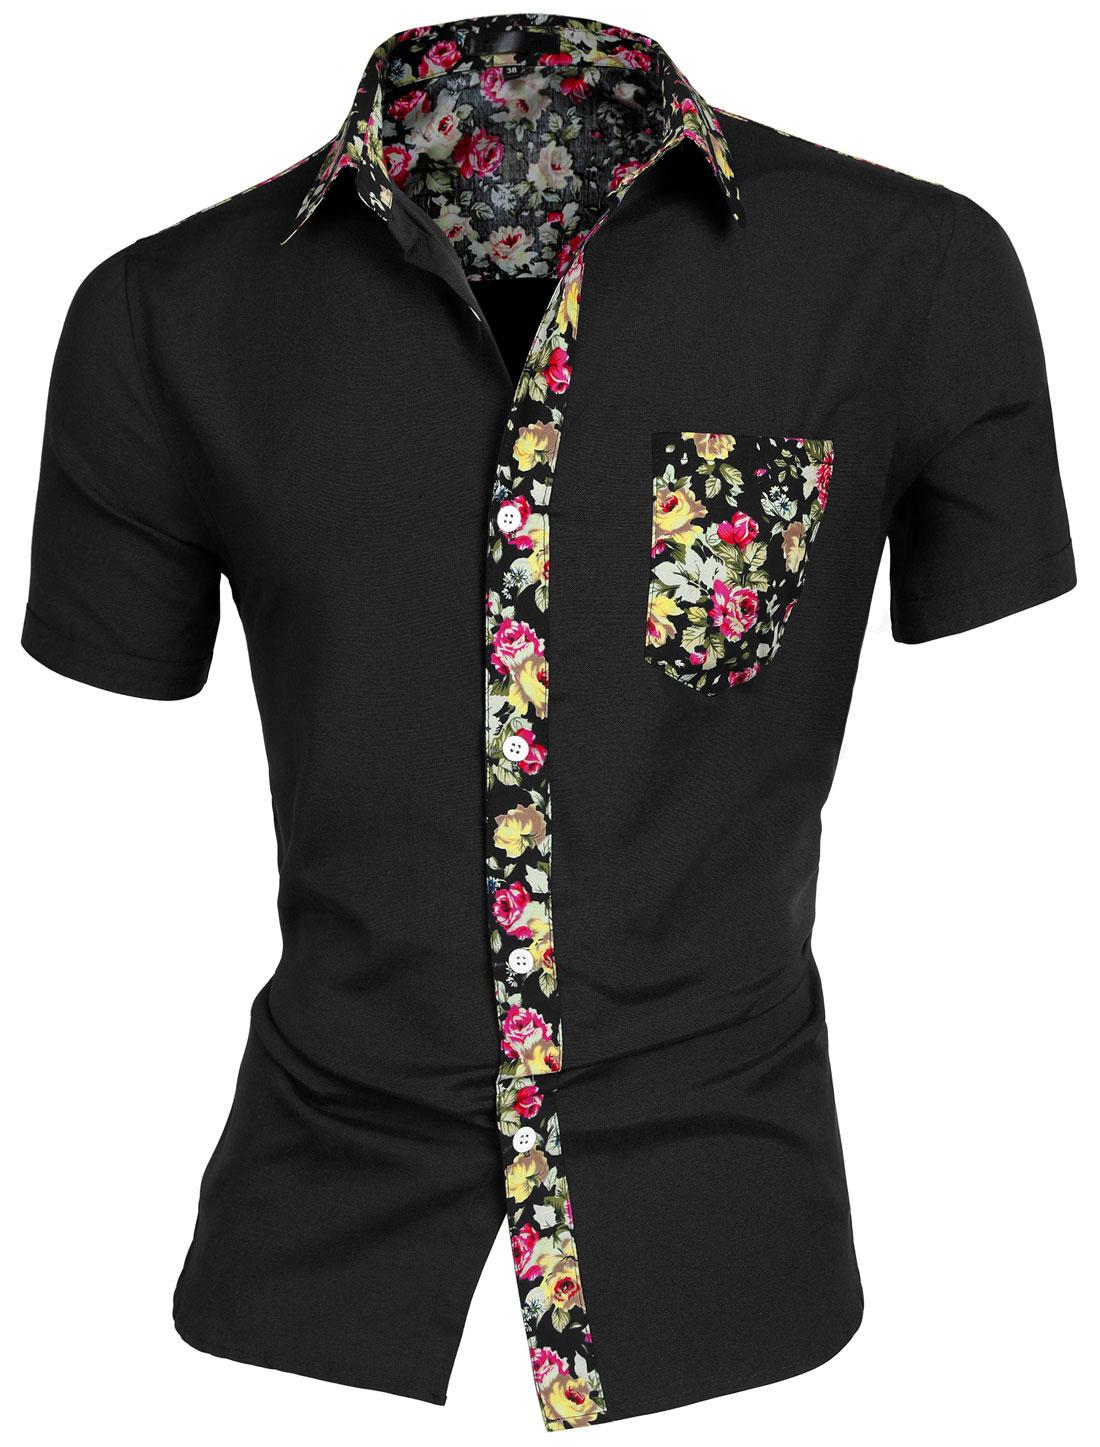 Men Round Hem Floral Print Chest Pocket Short Sleeve Button Down Shirt Black S